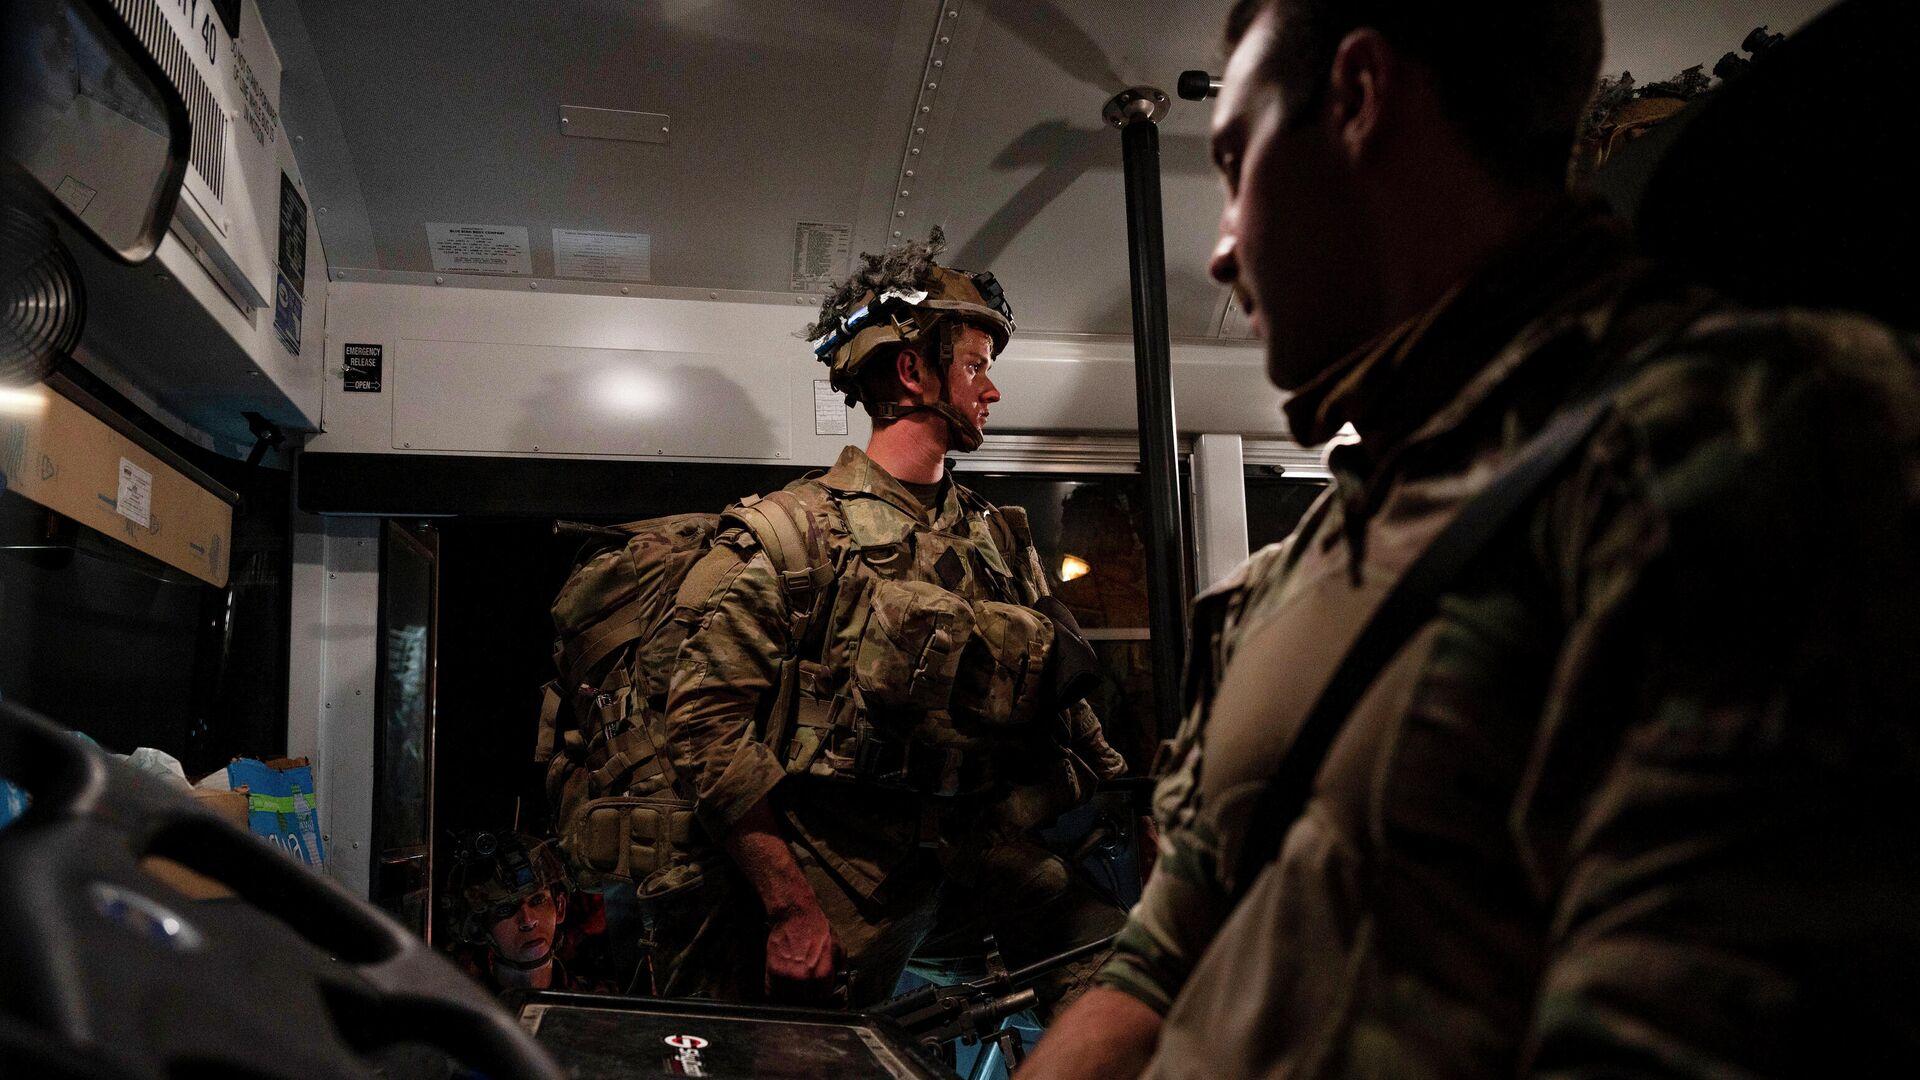 Militares estadounidenses abandonan Afganistán, el 31 de agosto de 2021 - Sputnik Mundo, 1920, 05.10.2021